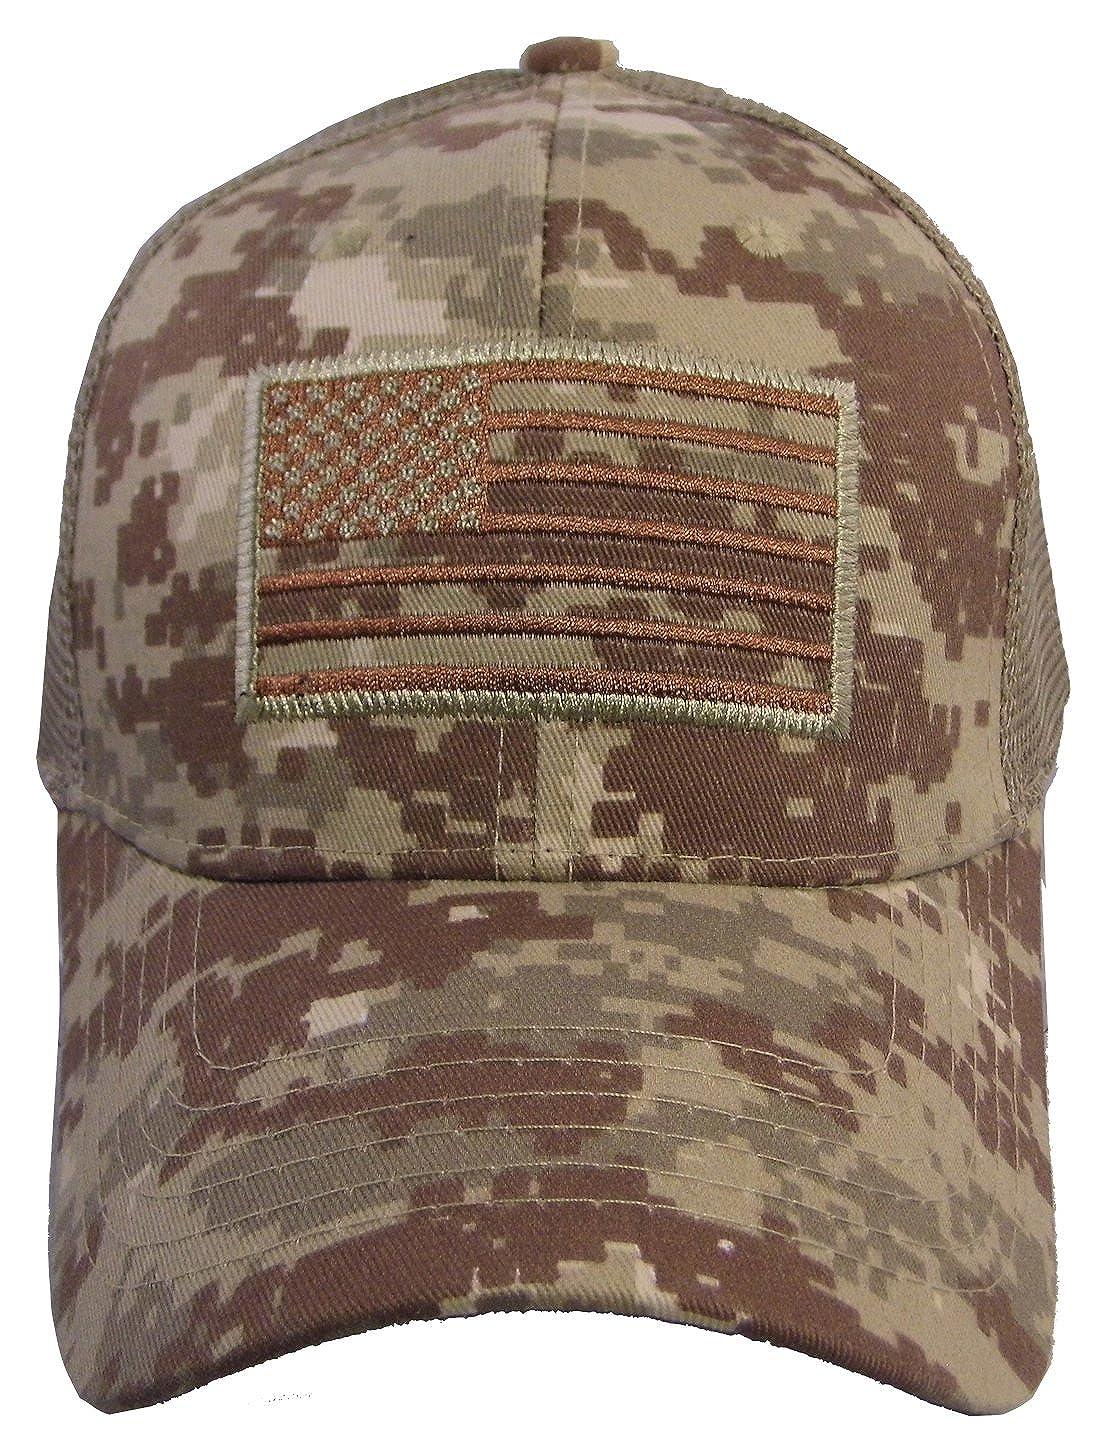 83164217102e2 USA American Flag Baseball Cap Military Army Operator Adjustable Hat (Acu.  Camo) at Amazon Men s Clothing store